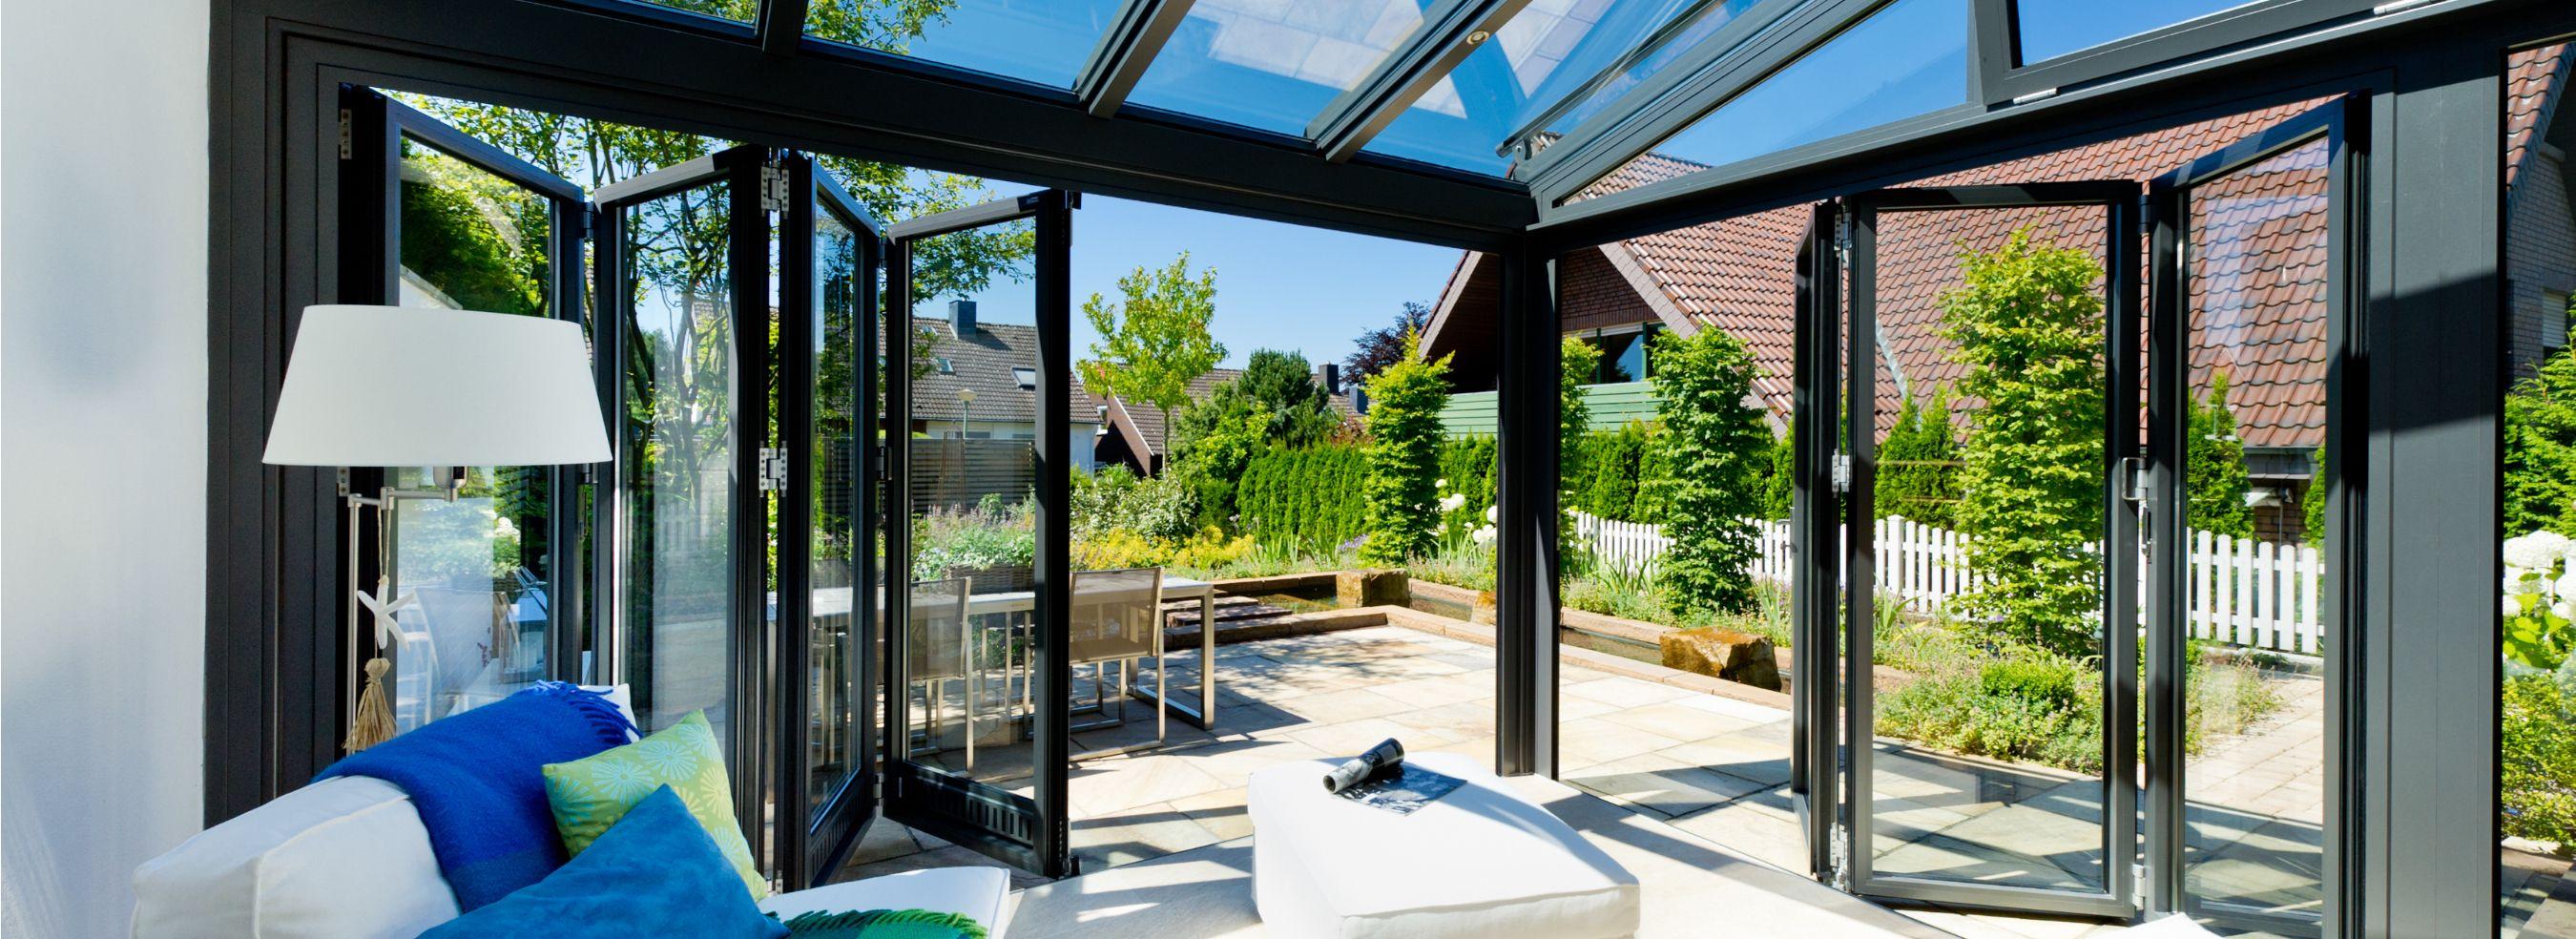 Wintergarten Design